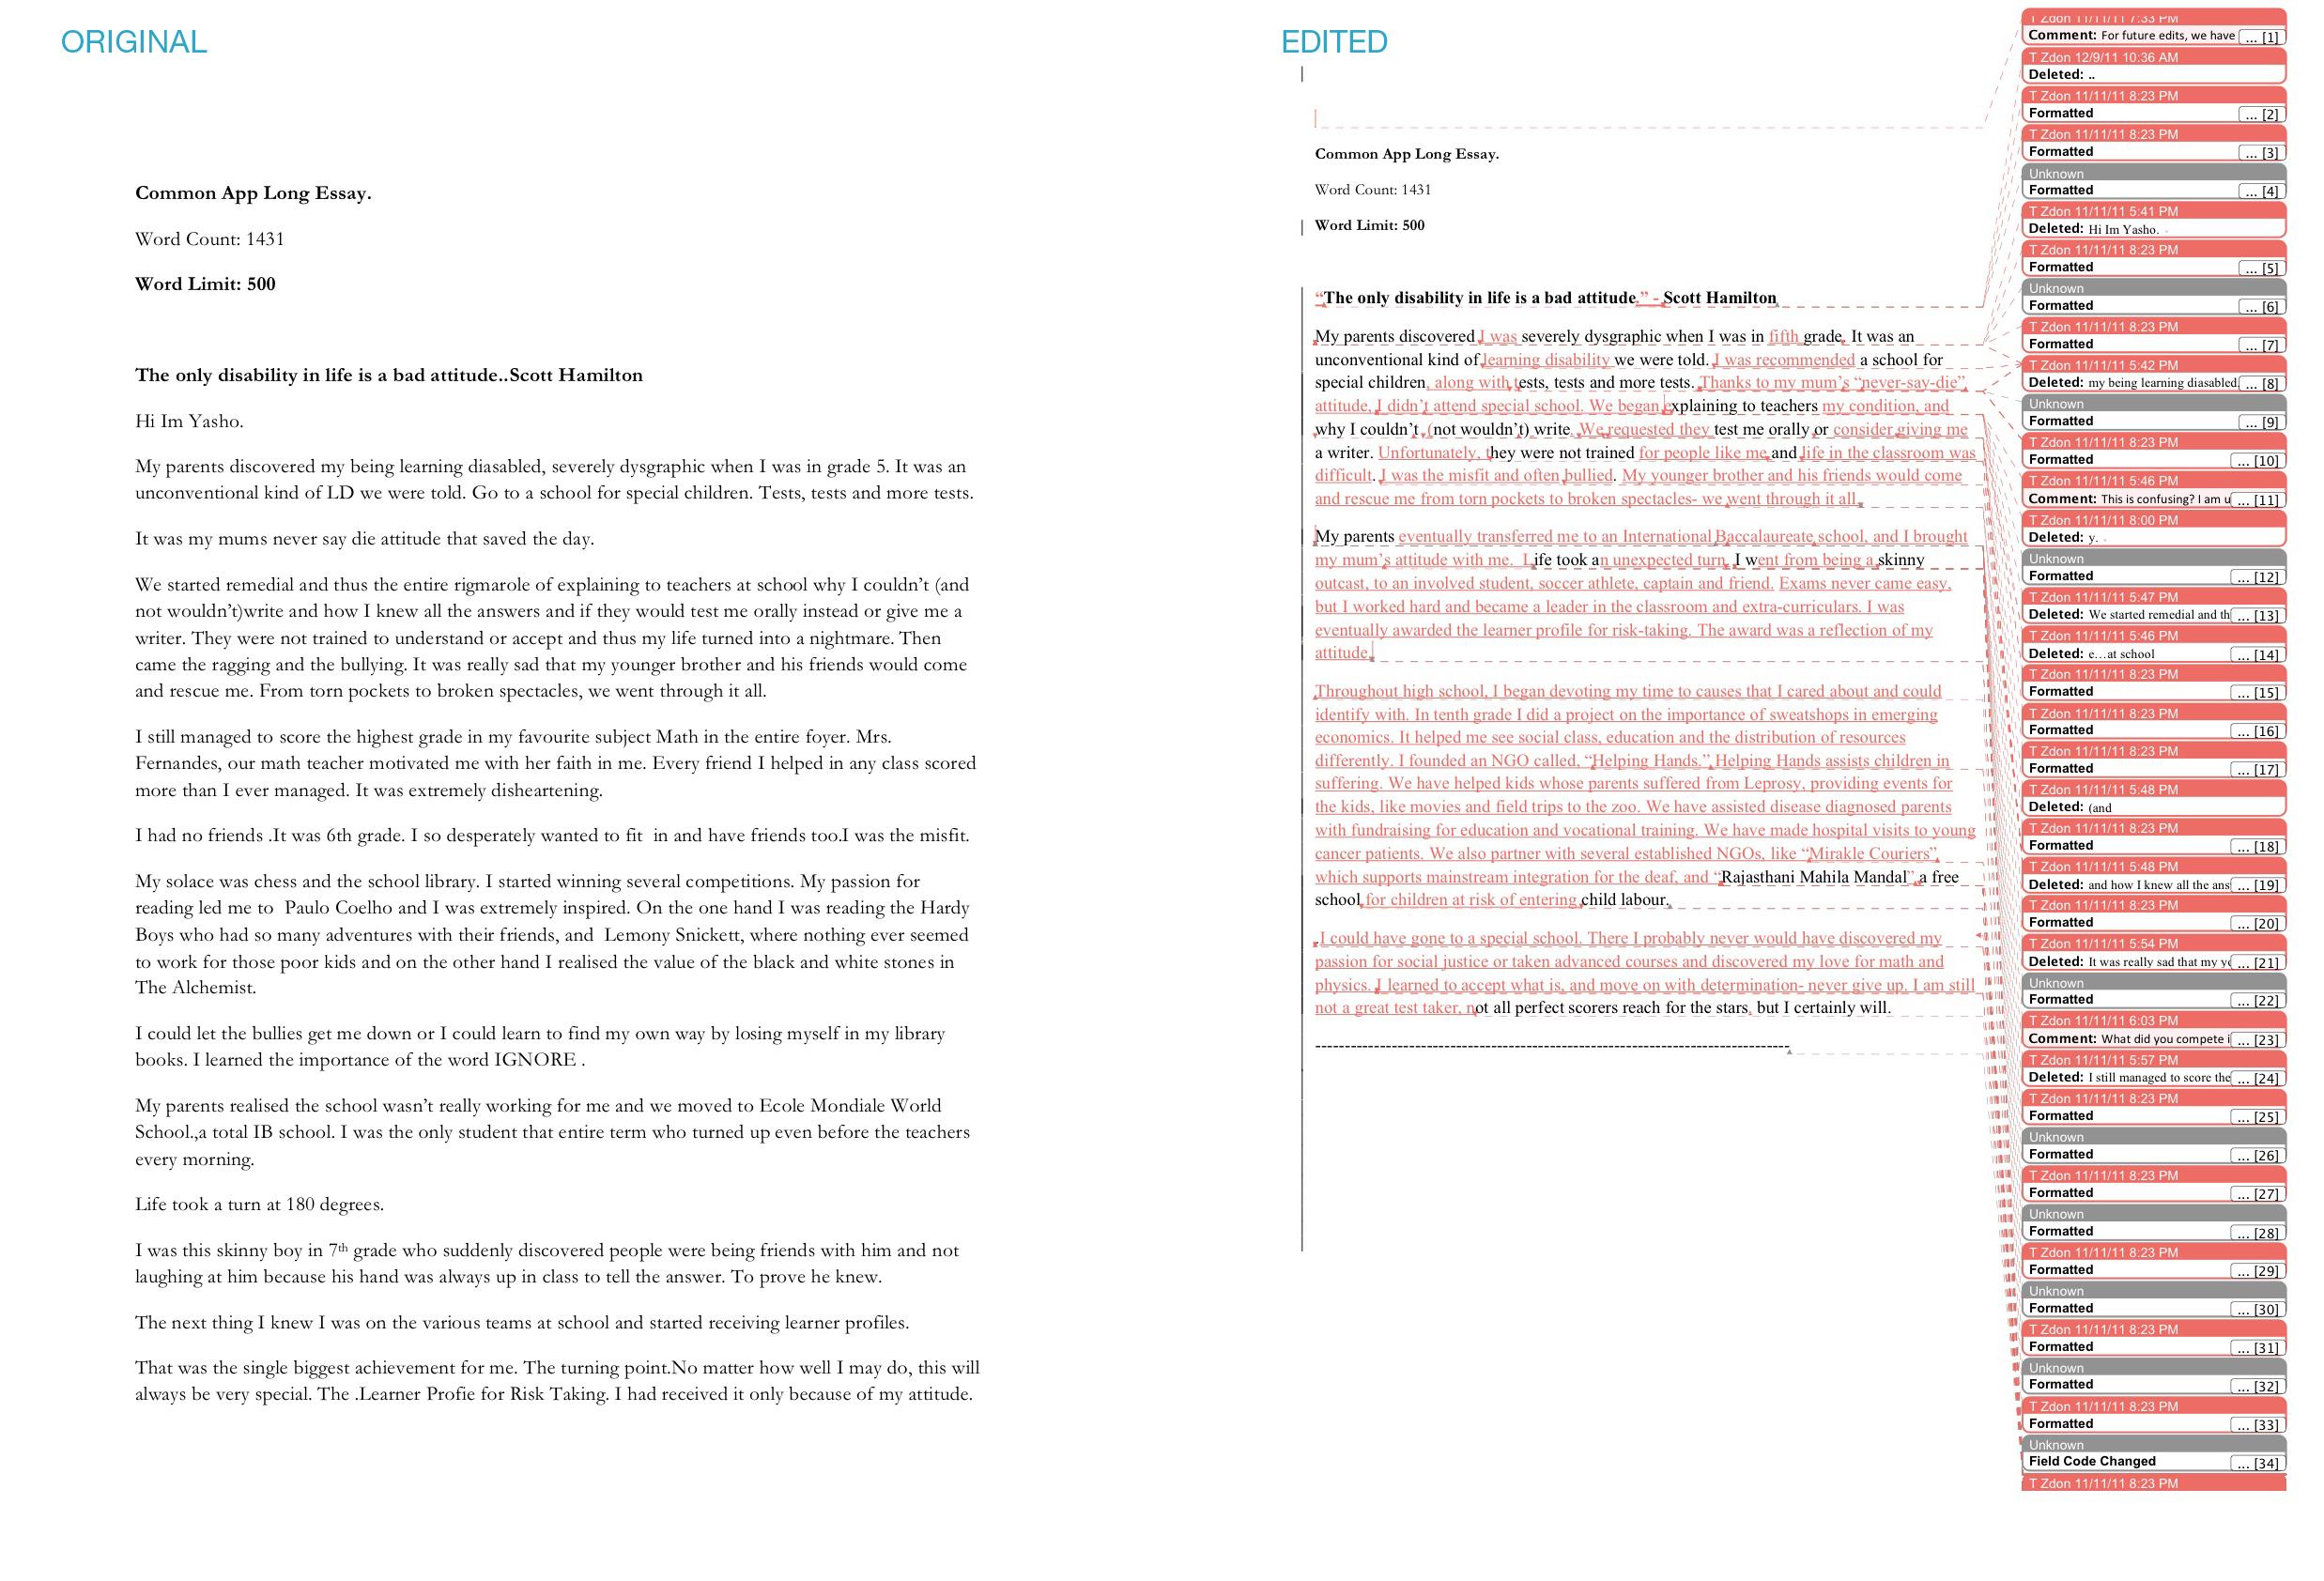 007 Common Application Essay App Example Best Essays Examples Harvard Prompts 2014-15 Full